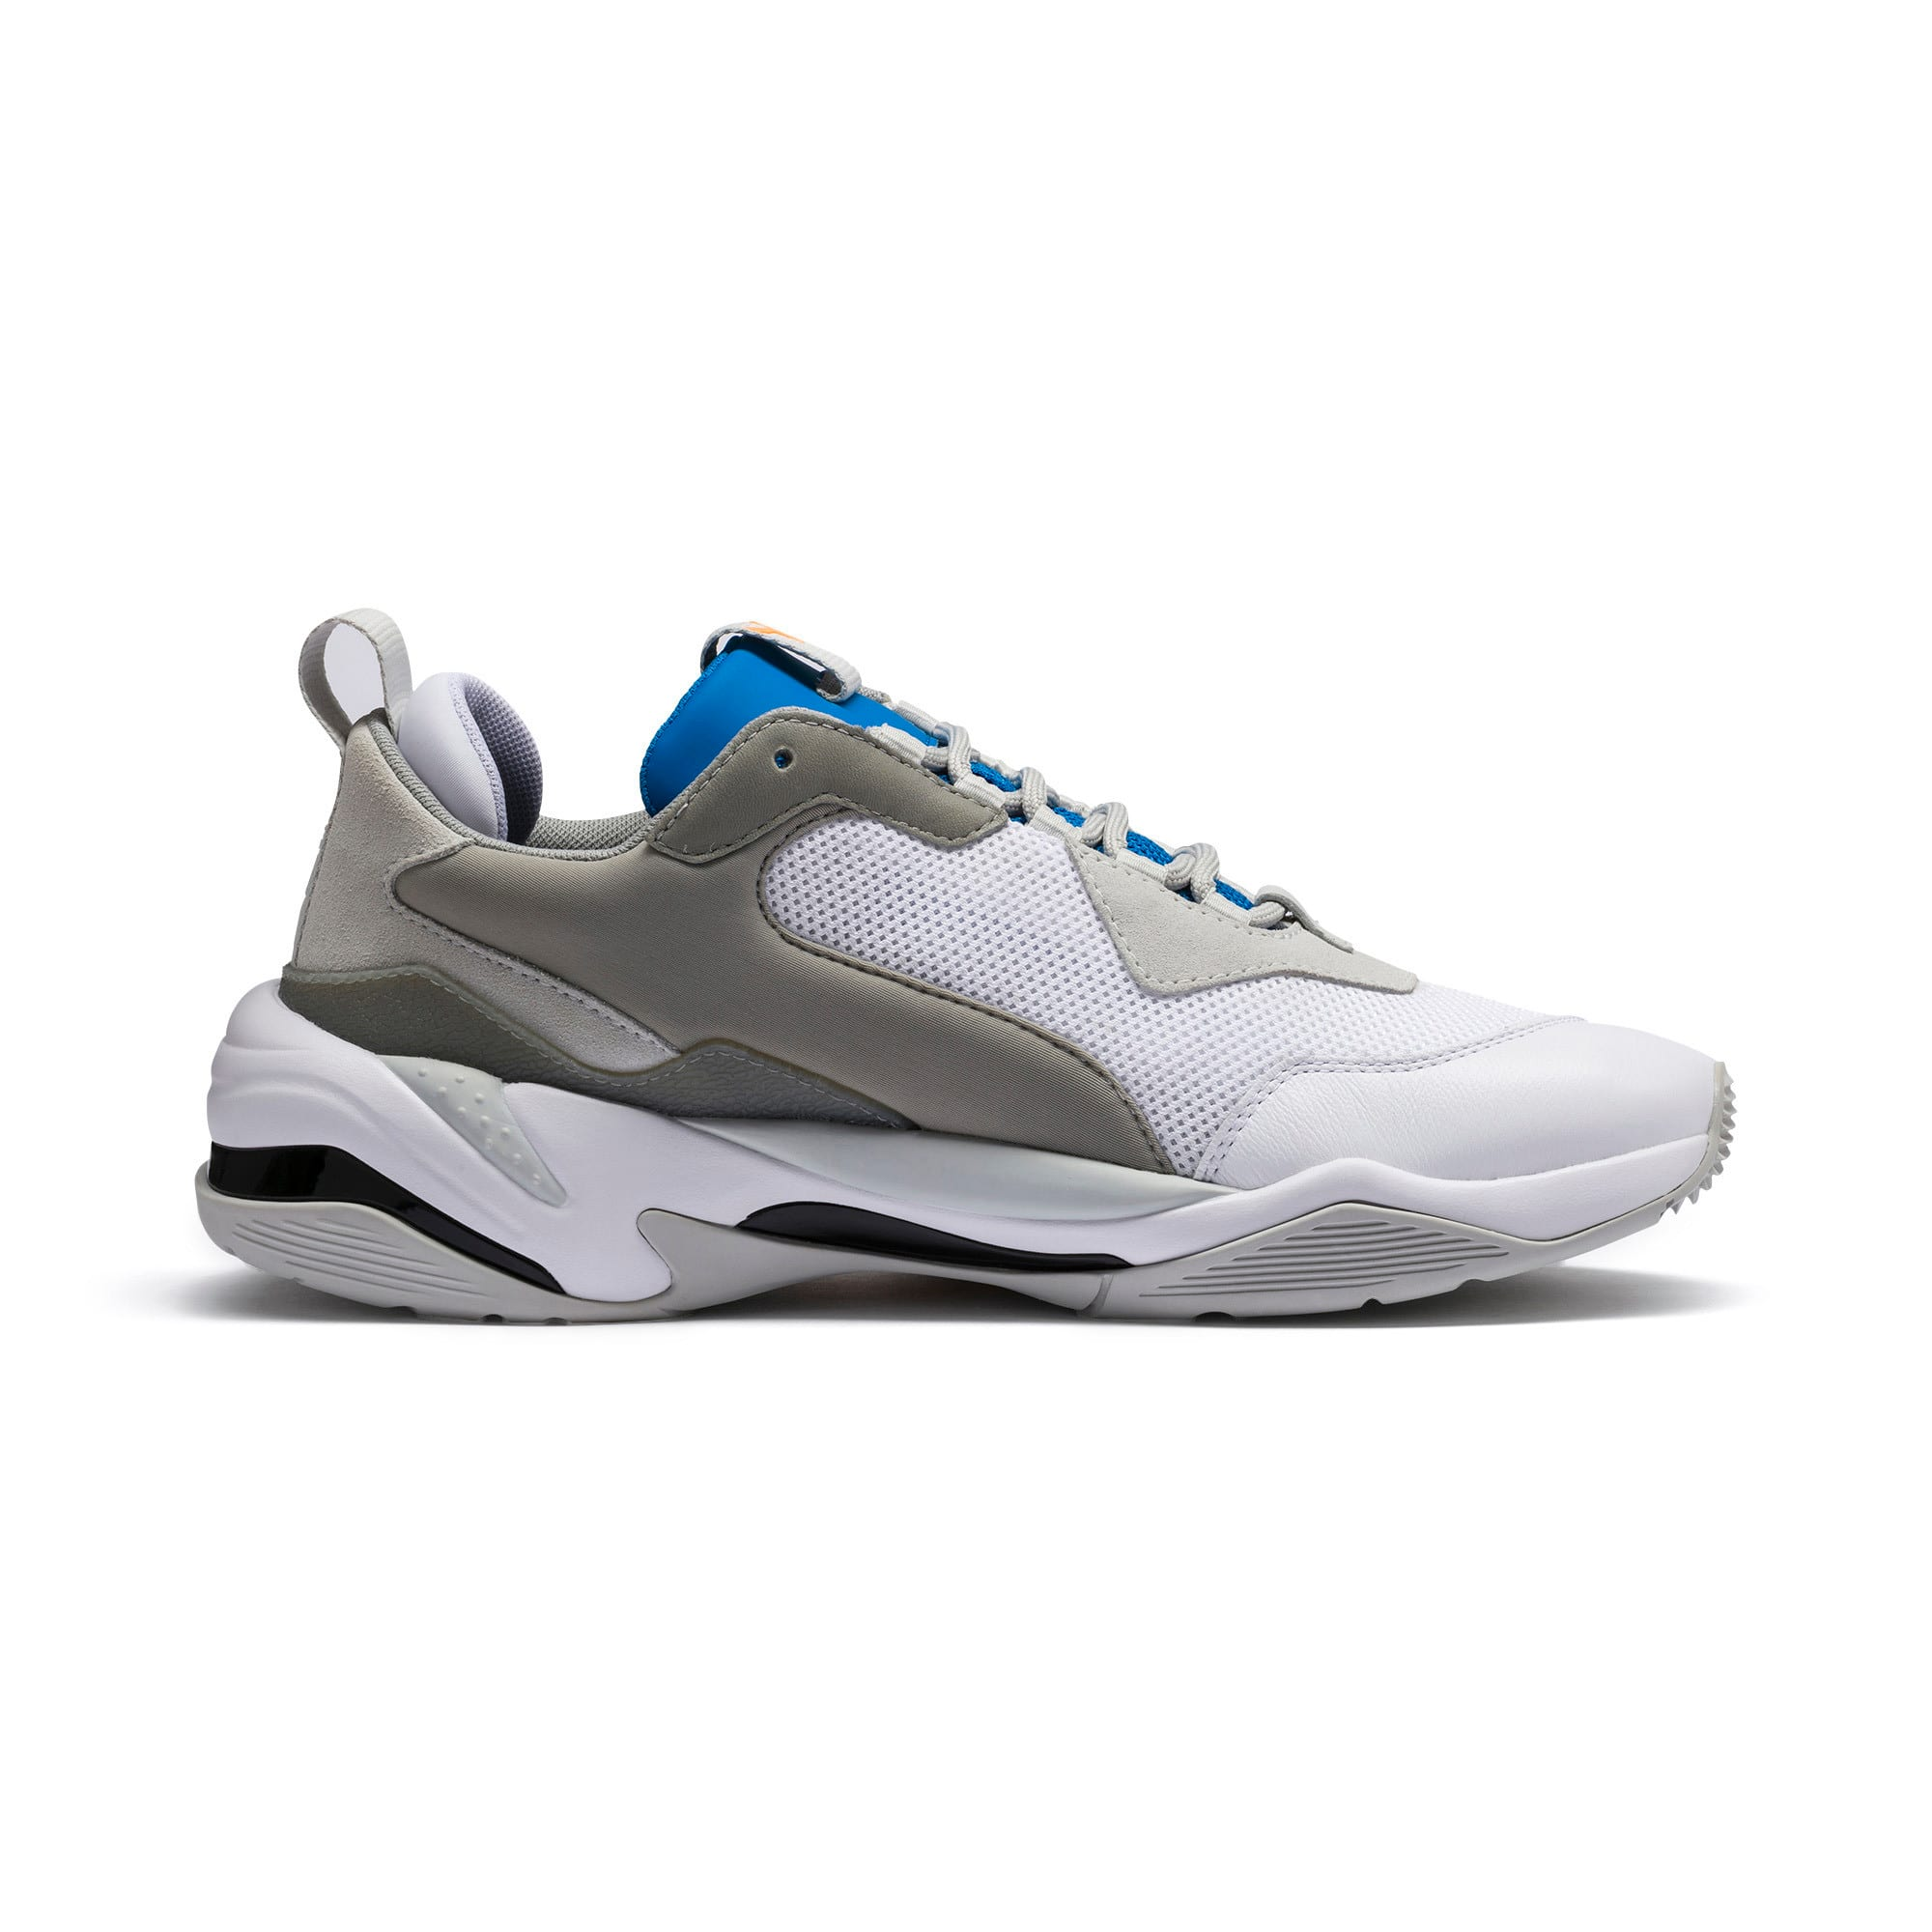 Thumbnail 5 of Thunder Spectra Sneakers, Glacier Gray-Indigo Bunting, medium